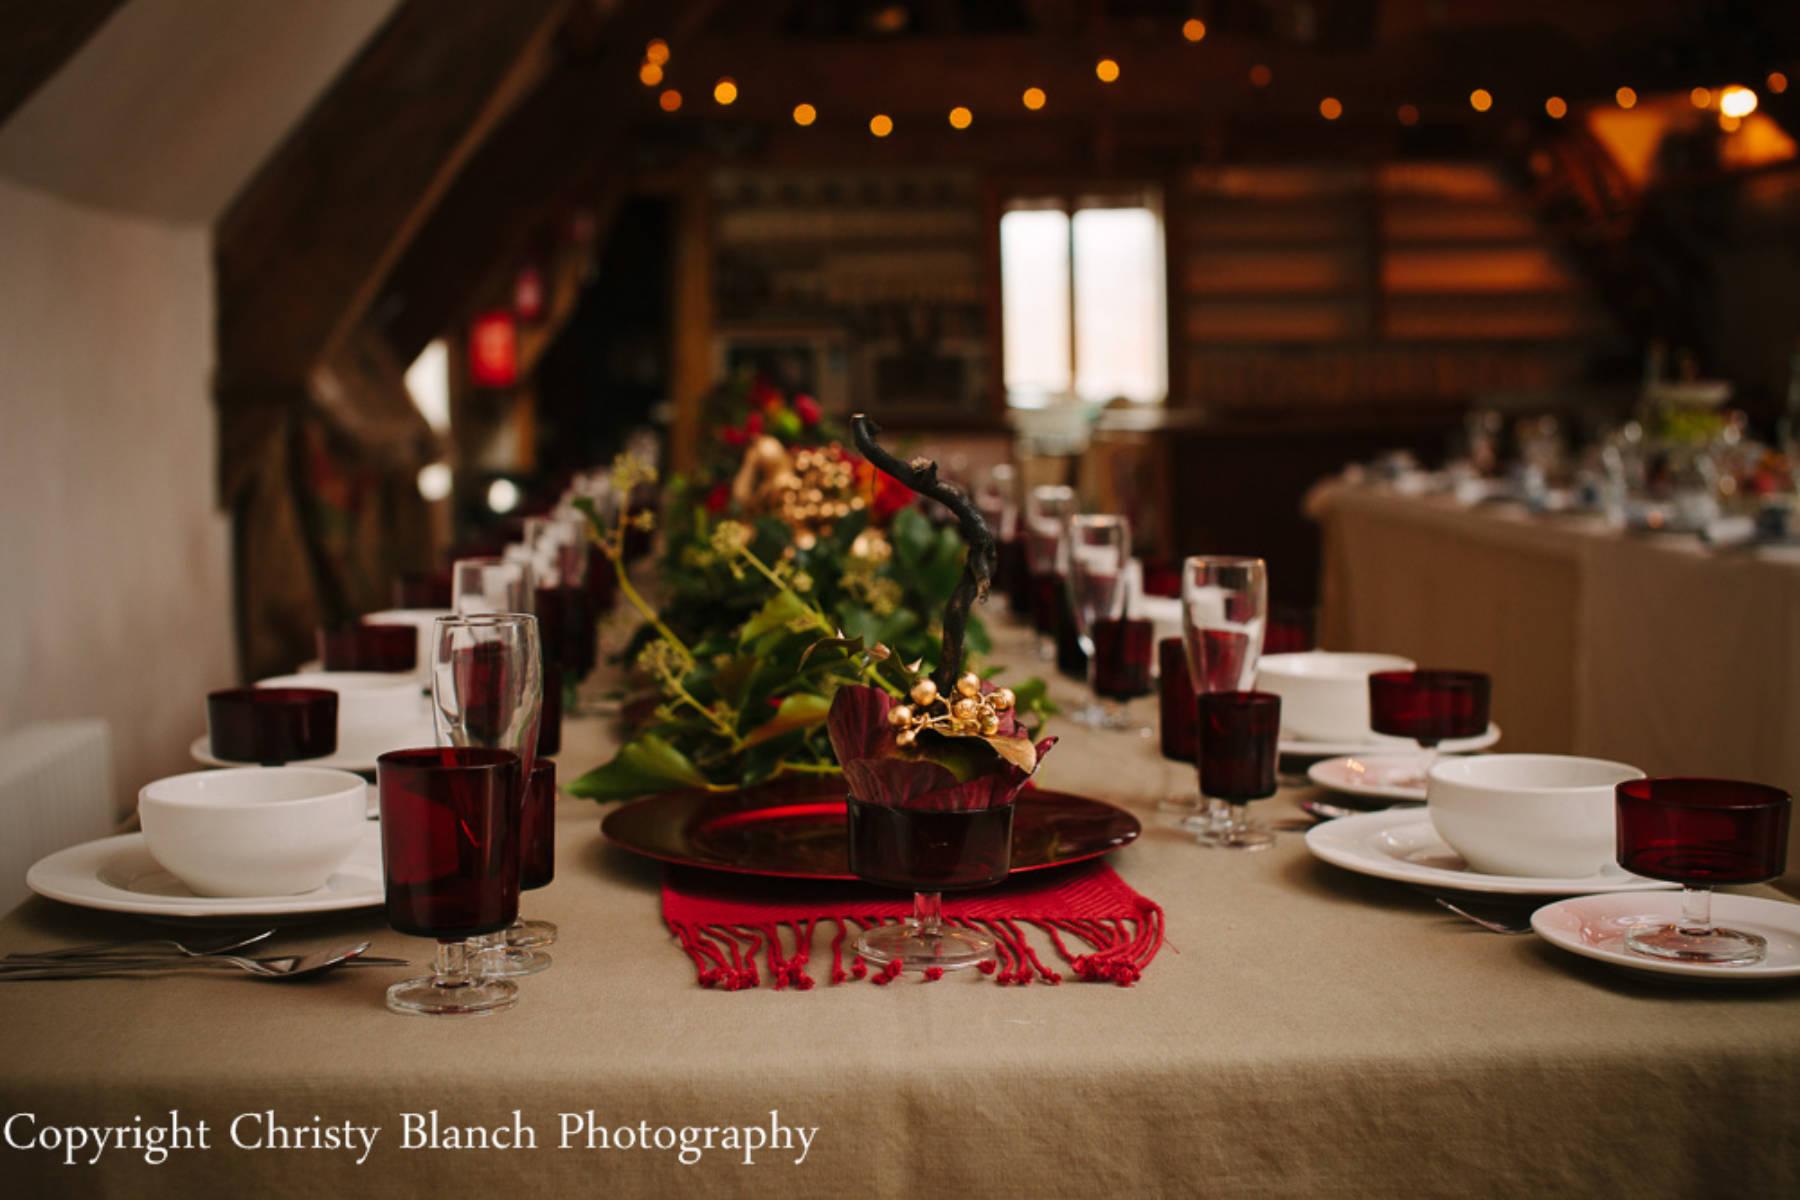 bordello christmas-Christy-Blanch-Photography.jpg